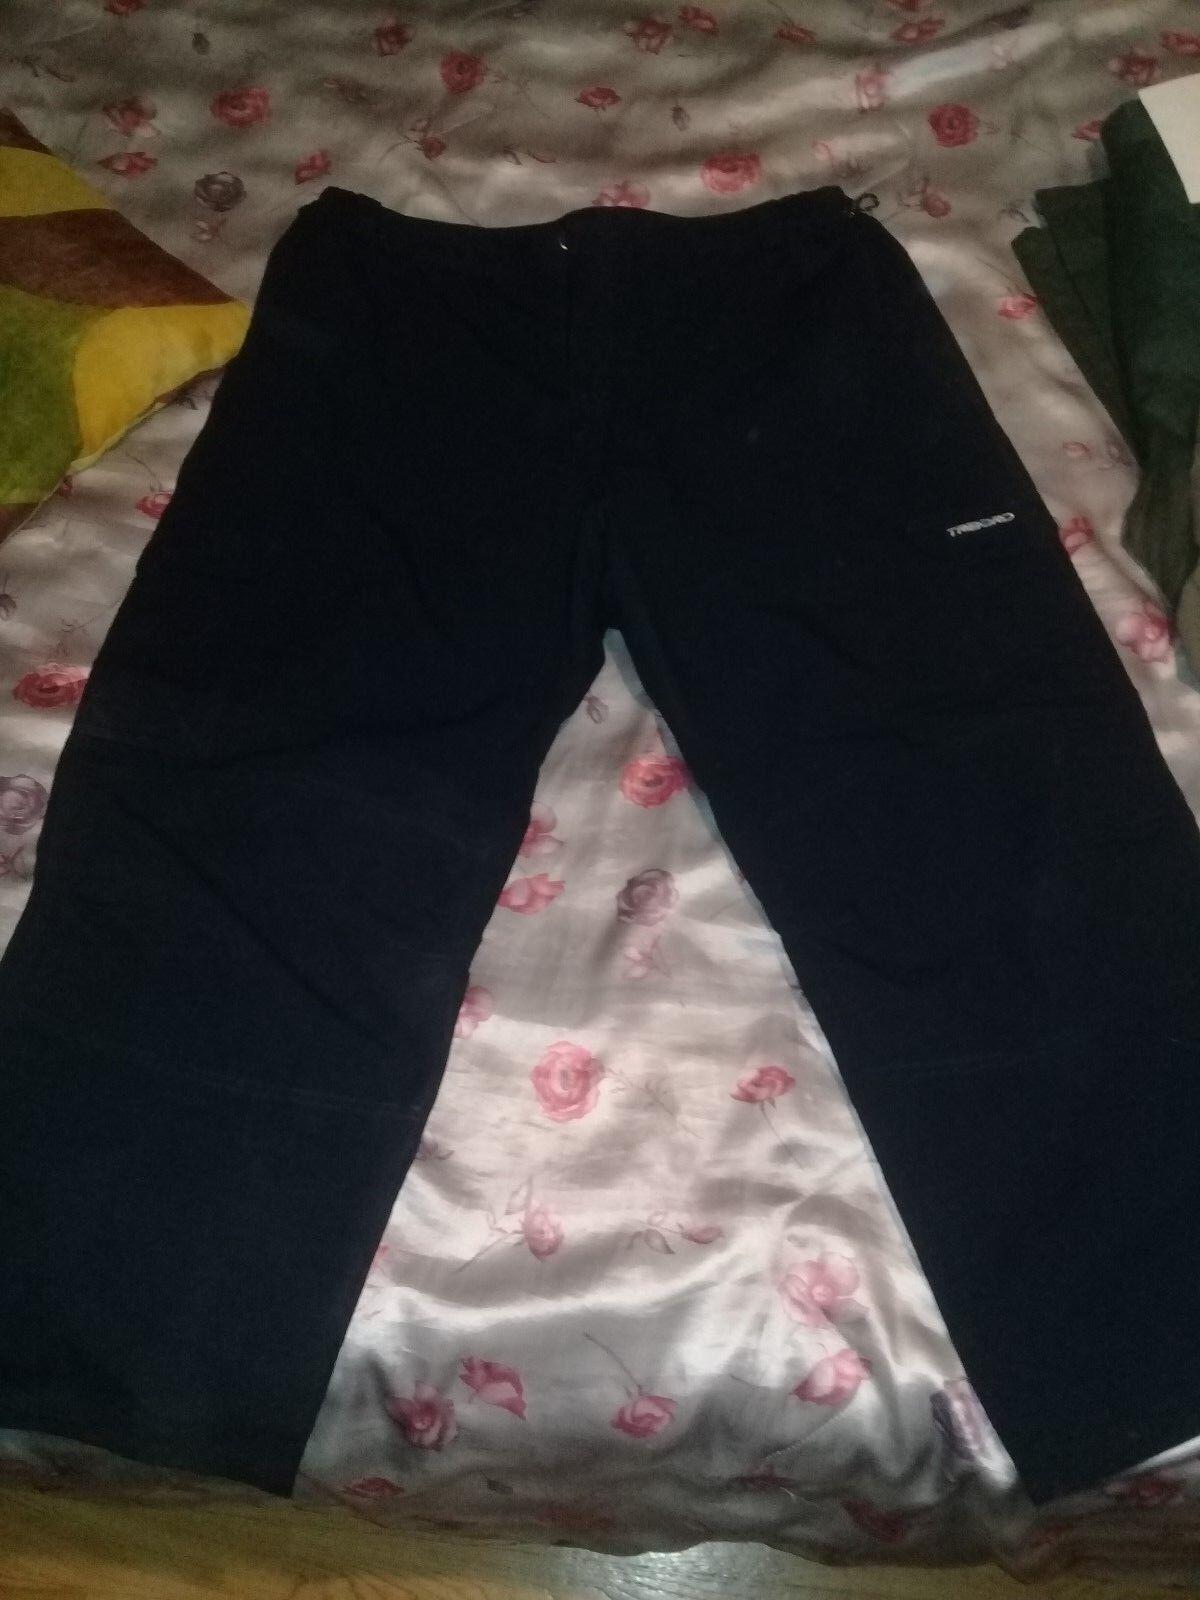 Pantalon TRIBORD DECATHLON blue marine 50% coton 50% polyester size 3XL